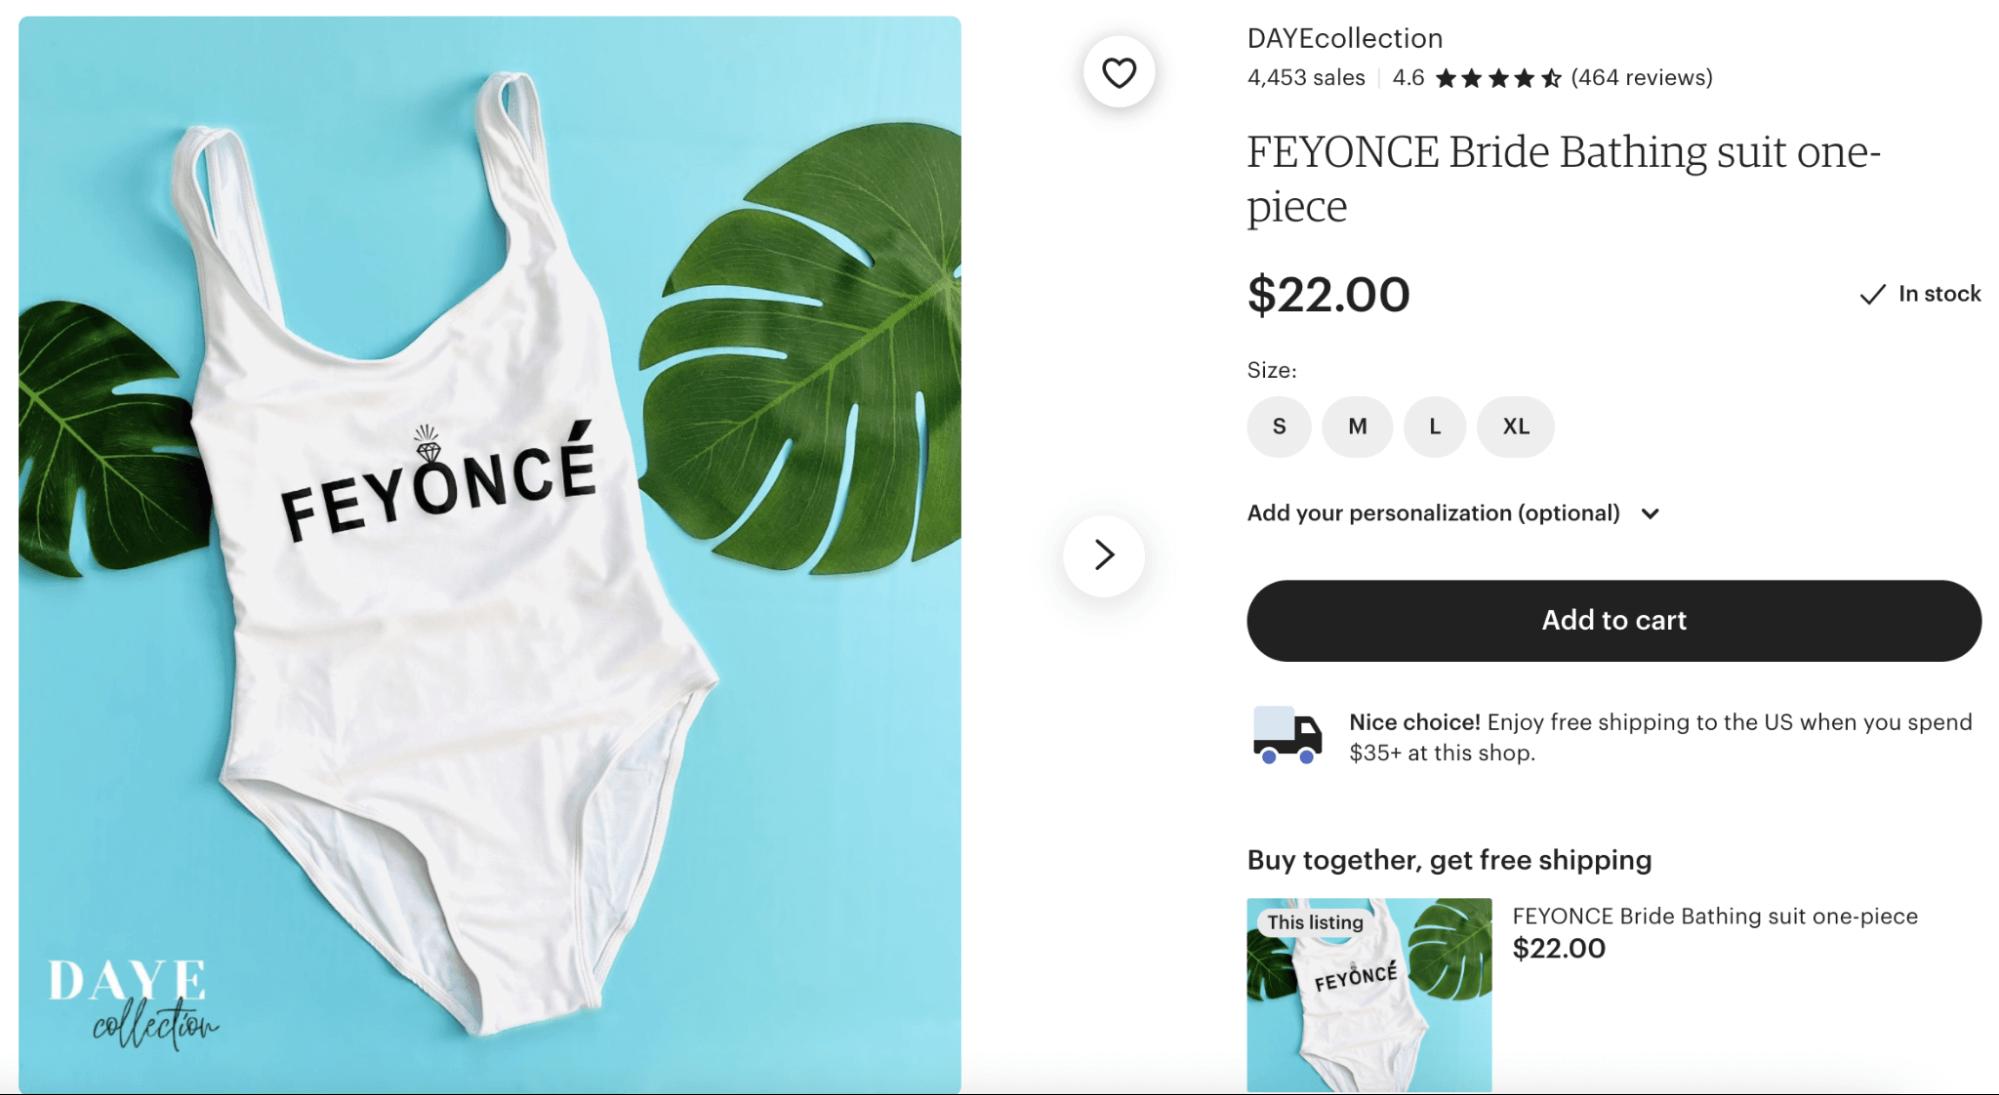 bride swimsuit: Feyonce bride bathing suit one-piece